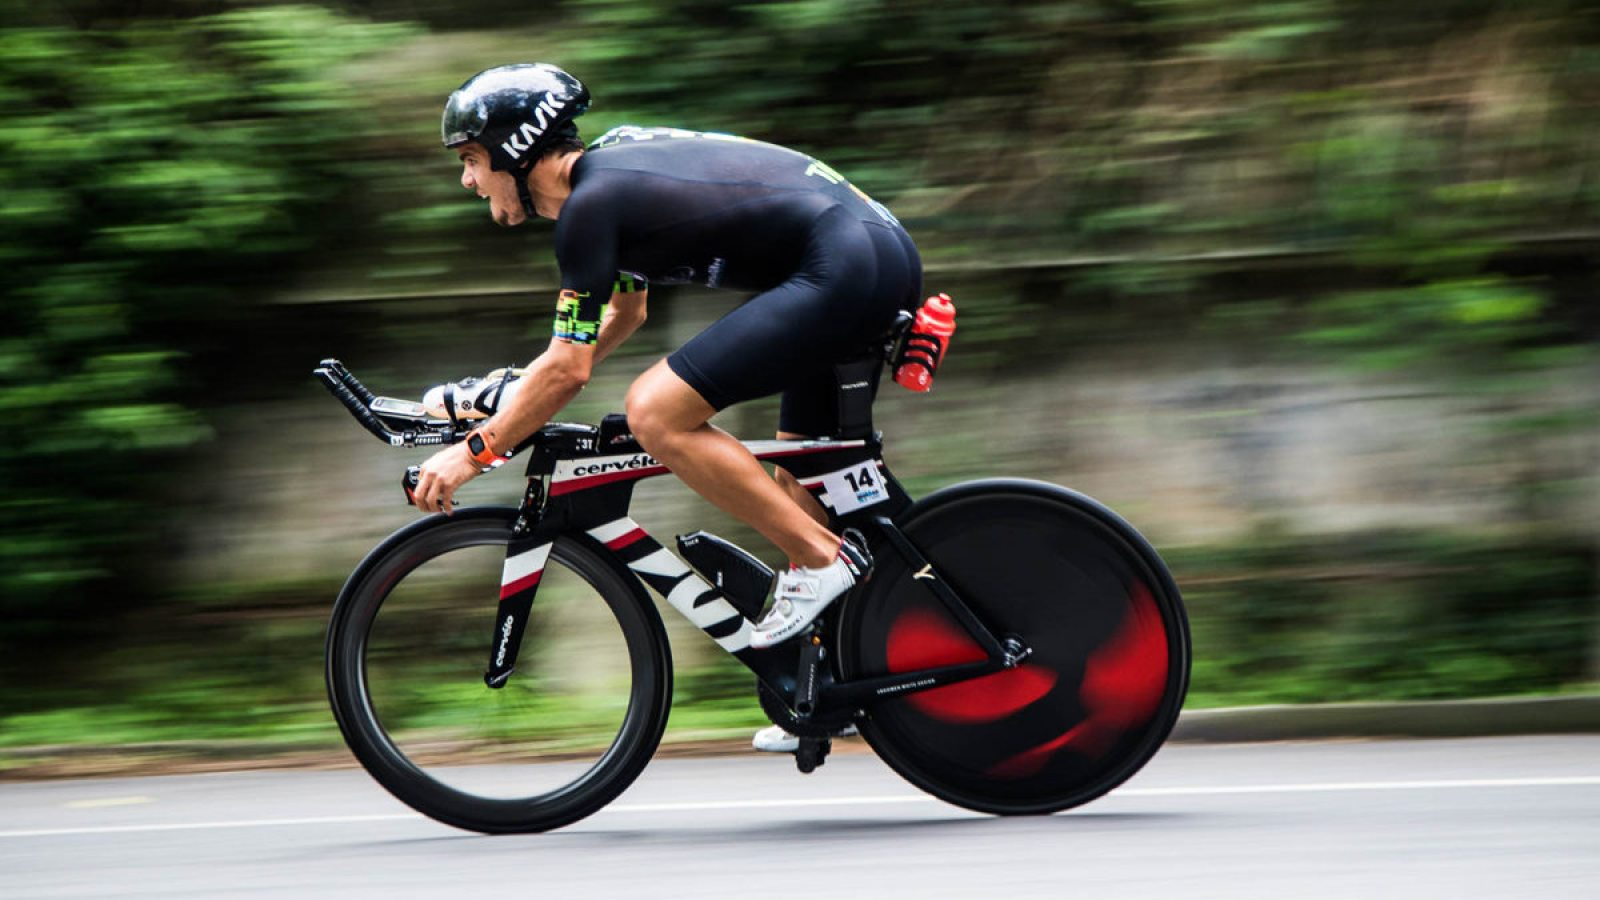 bc33f8f5f1e29 Galeria: Caixa Ironman 70.3 Rio de Janeiro – Tri Sport Magazine – News,  Triathlon, Ironman, Endurance, Perfomance